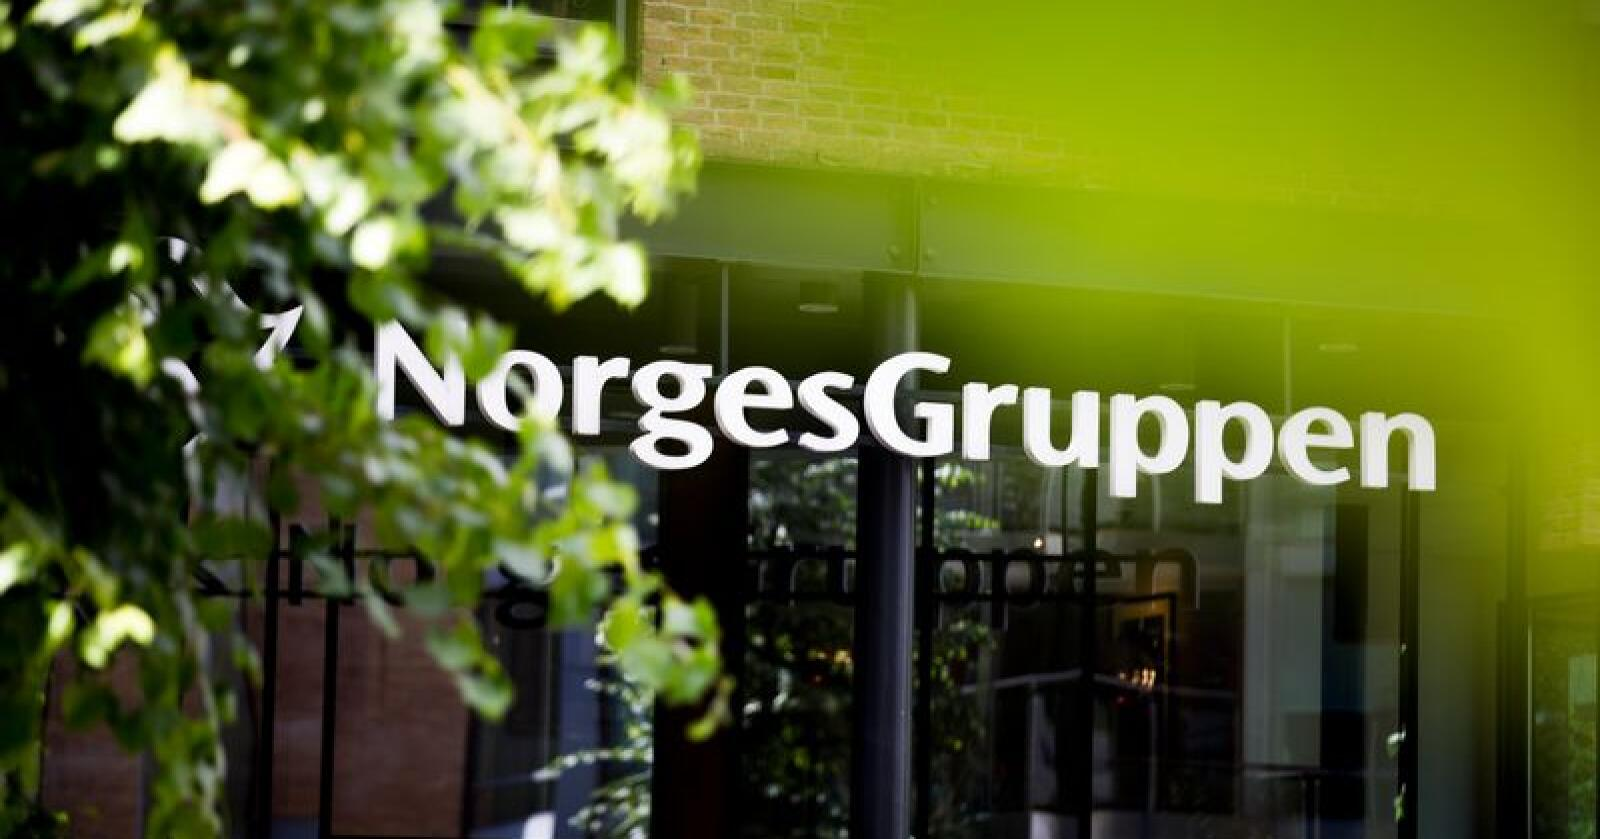 Konkurransetilsynet har vært på besøk hos Norgesgruppen. Foto: Trond Reidar Teigen / NTB scanpix